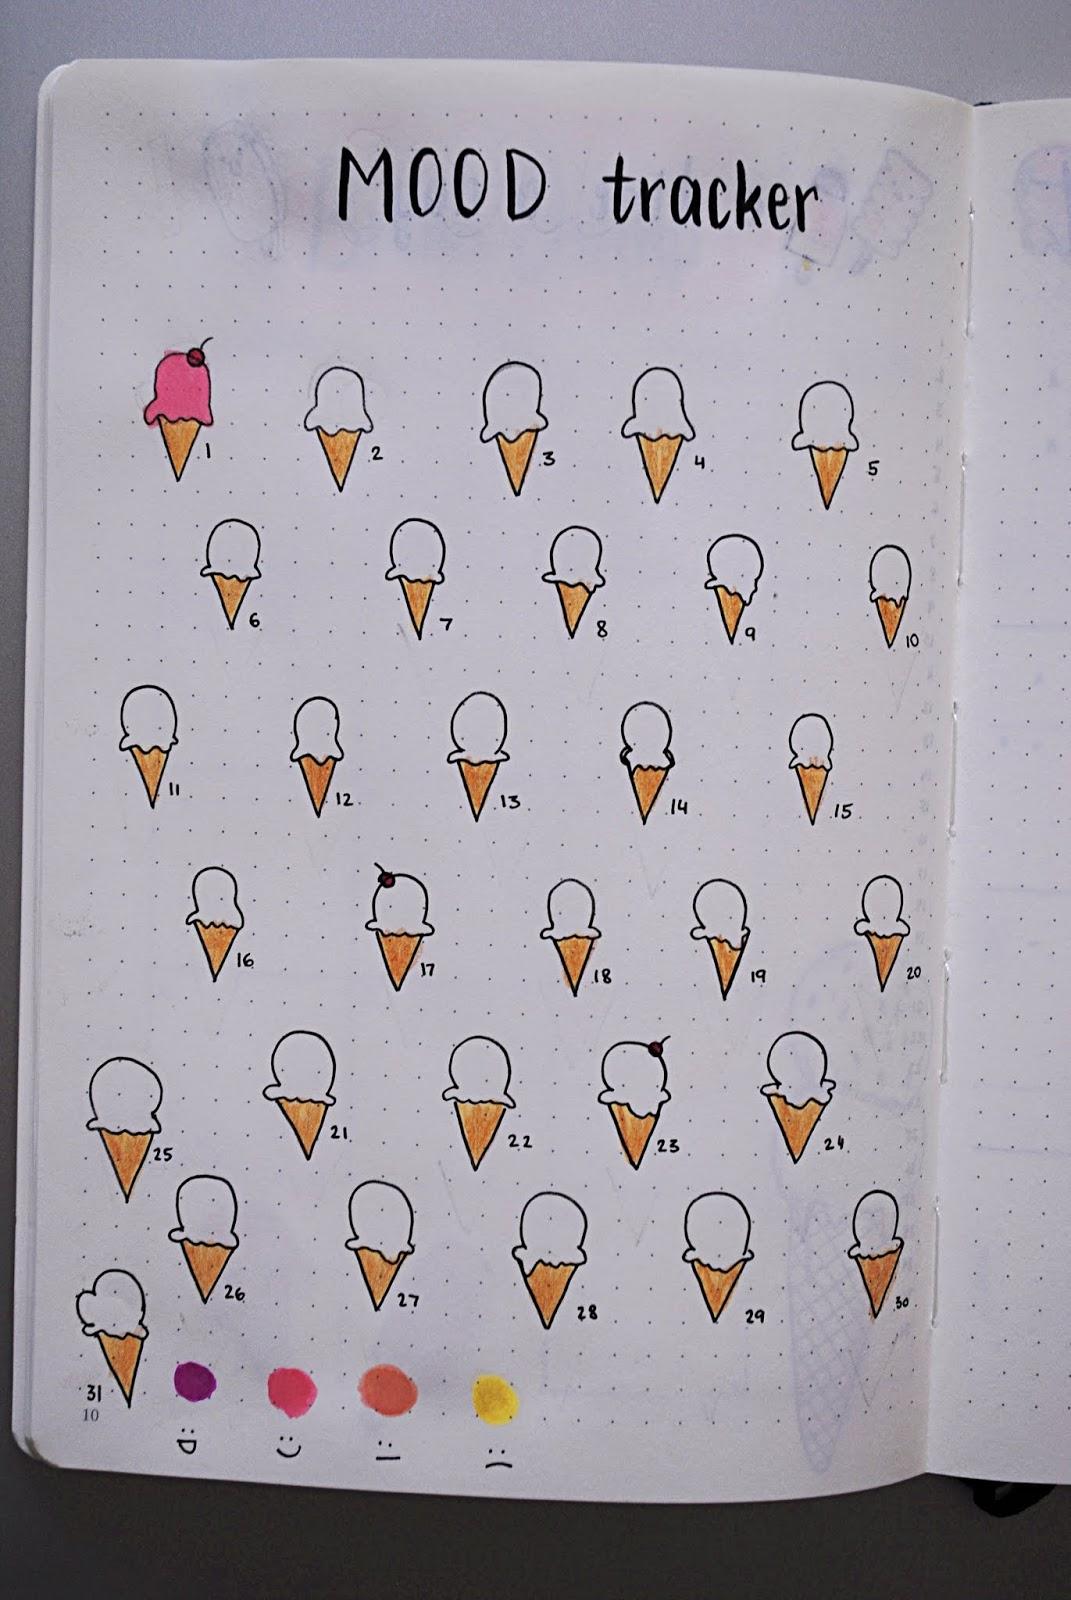 august ice cream mood tracker